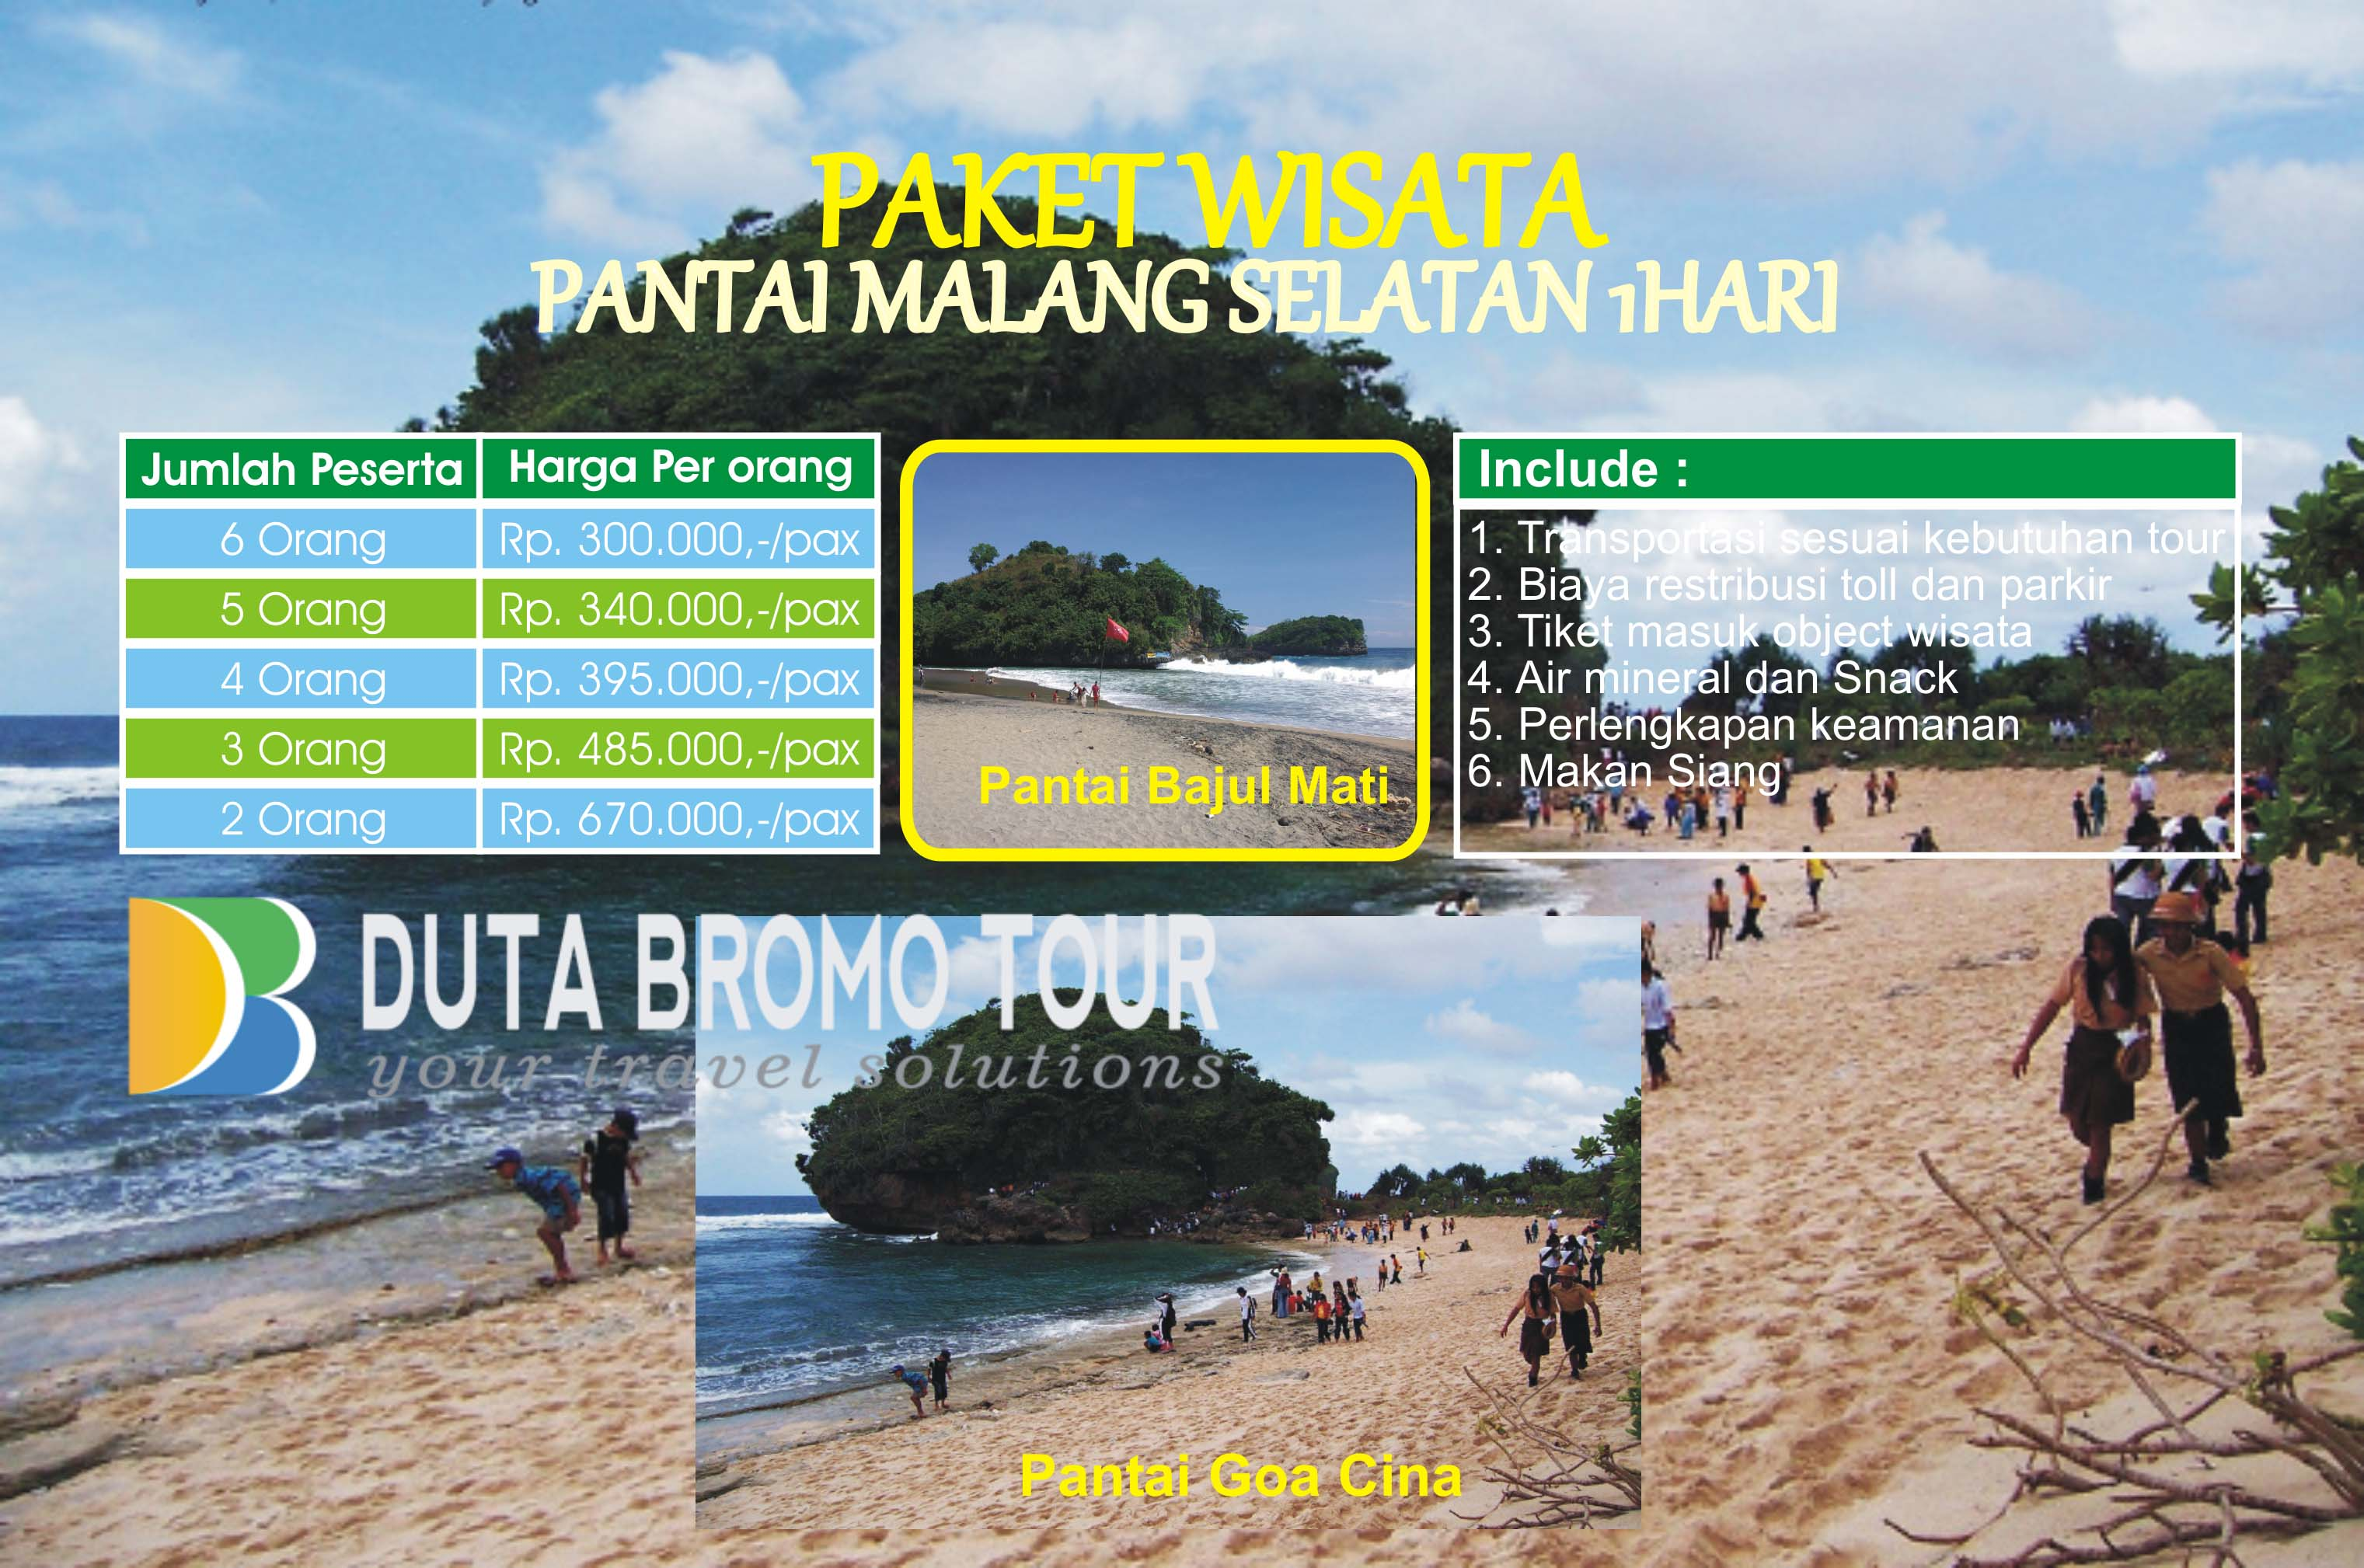 Duta Bromo Tour Paket Wisata Pantai Malang Selatan 1 Hari